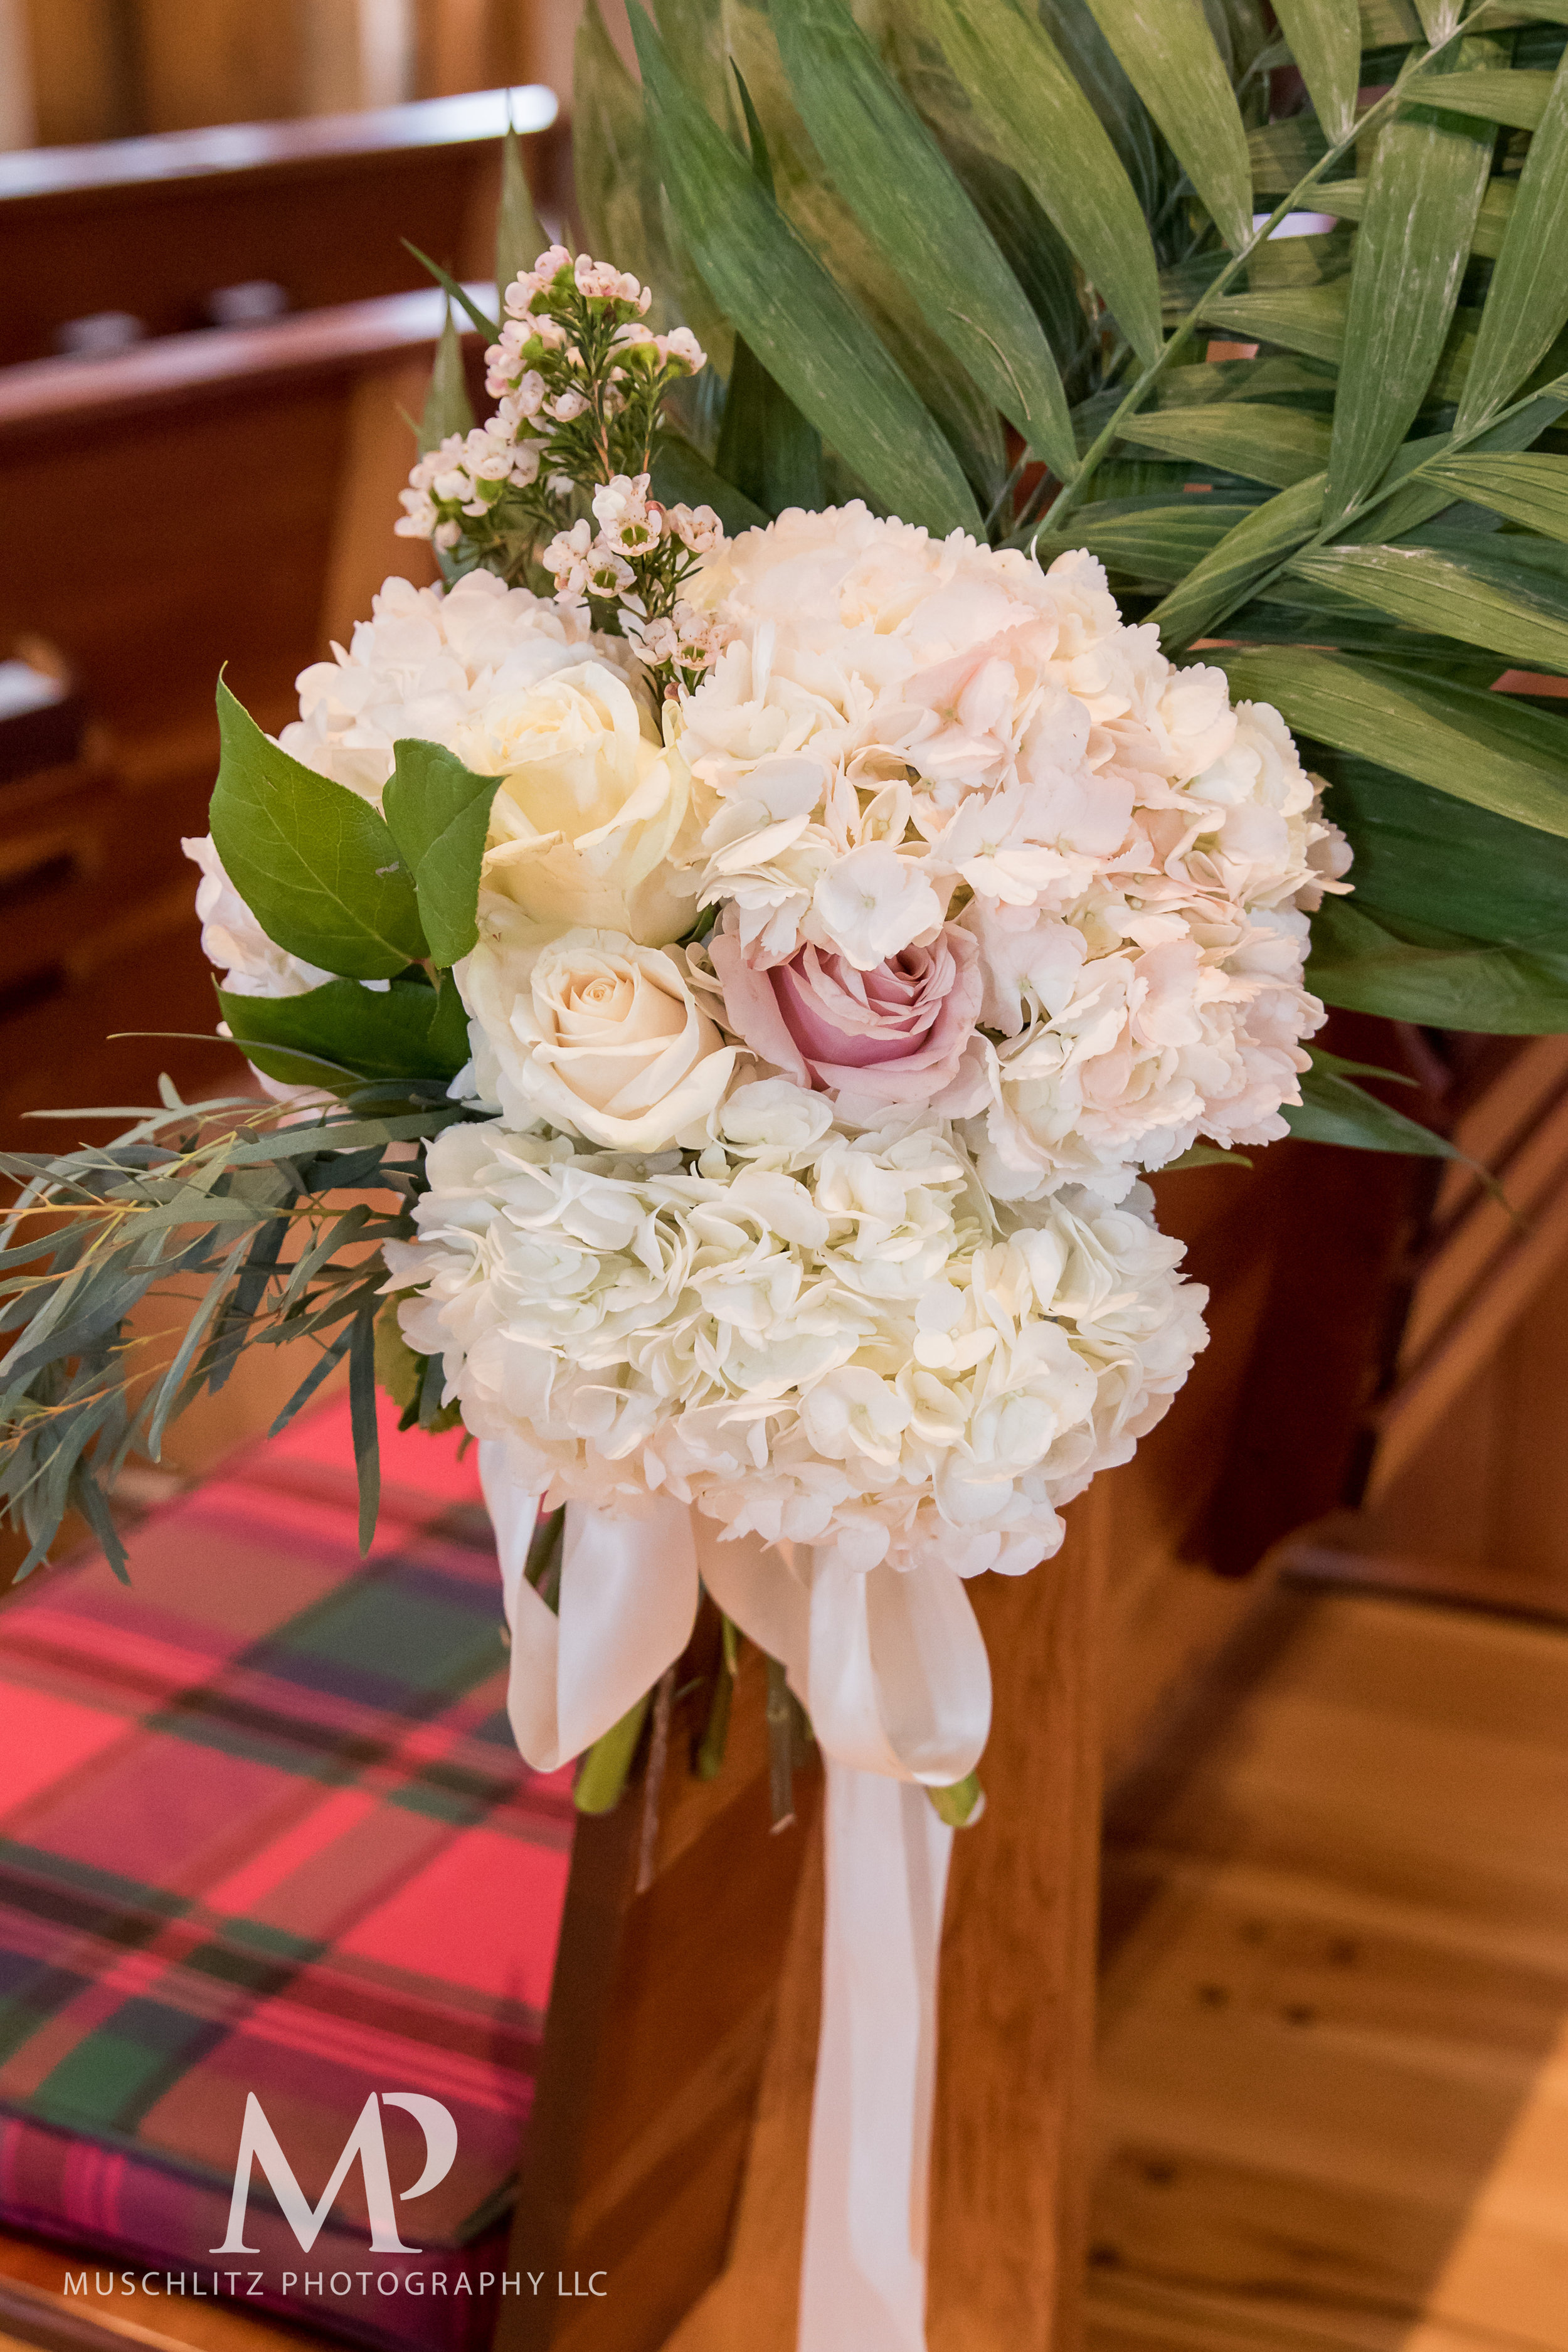 liberty-barn-presbyterian-church-wedding-delaware-columbus-ohio-muschlitz-photography-021.JPG